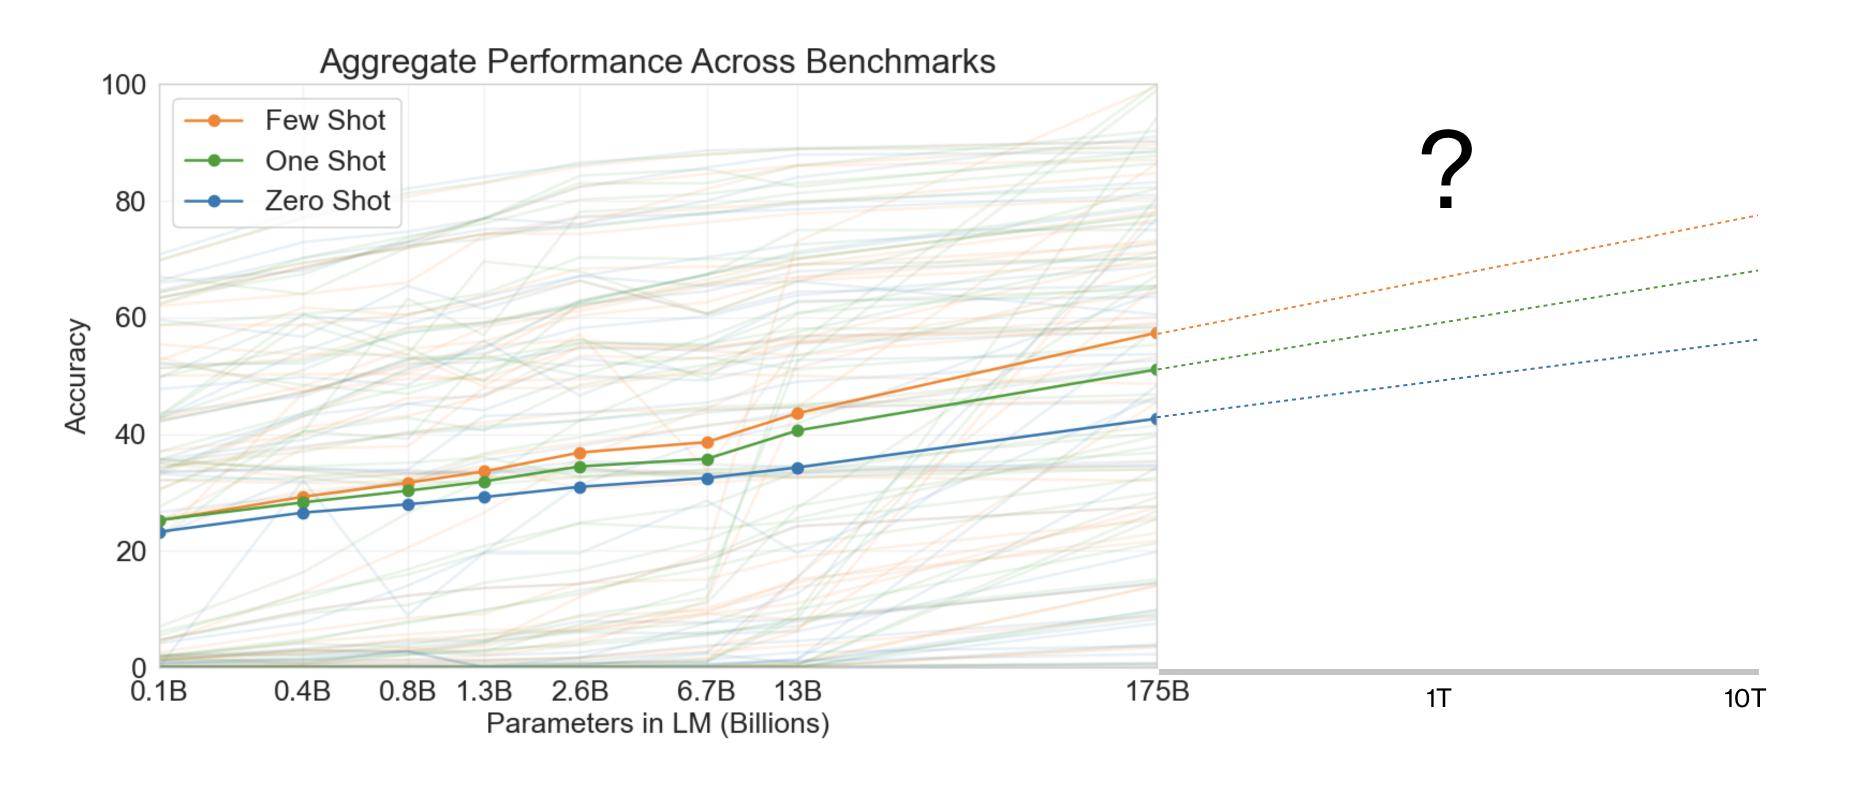 GPT-X model performance extrapolated